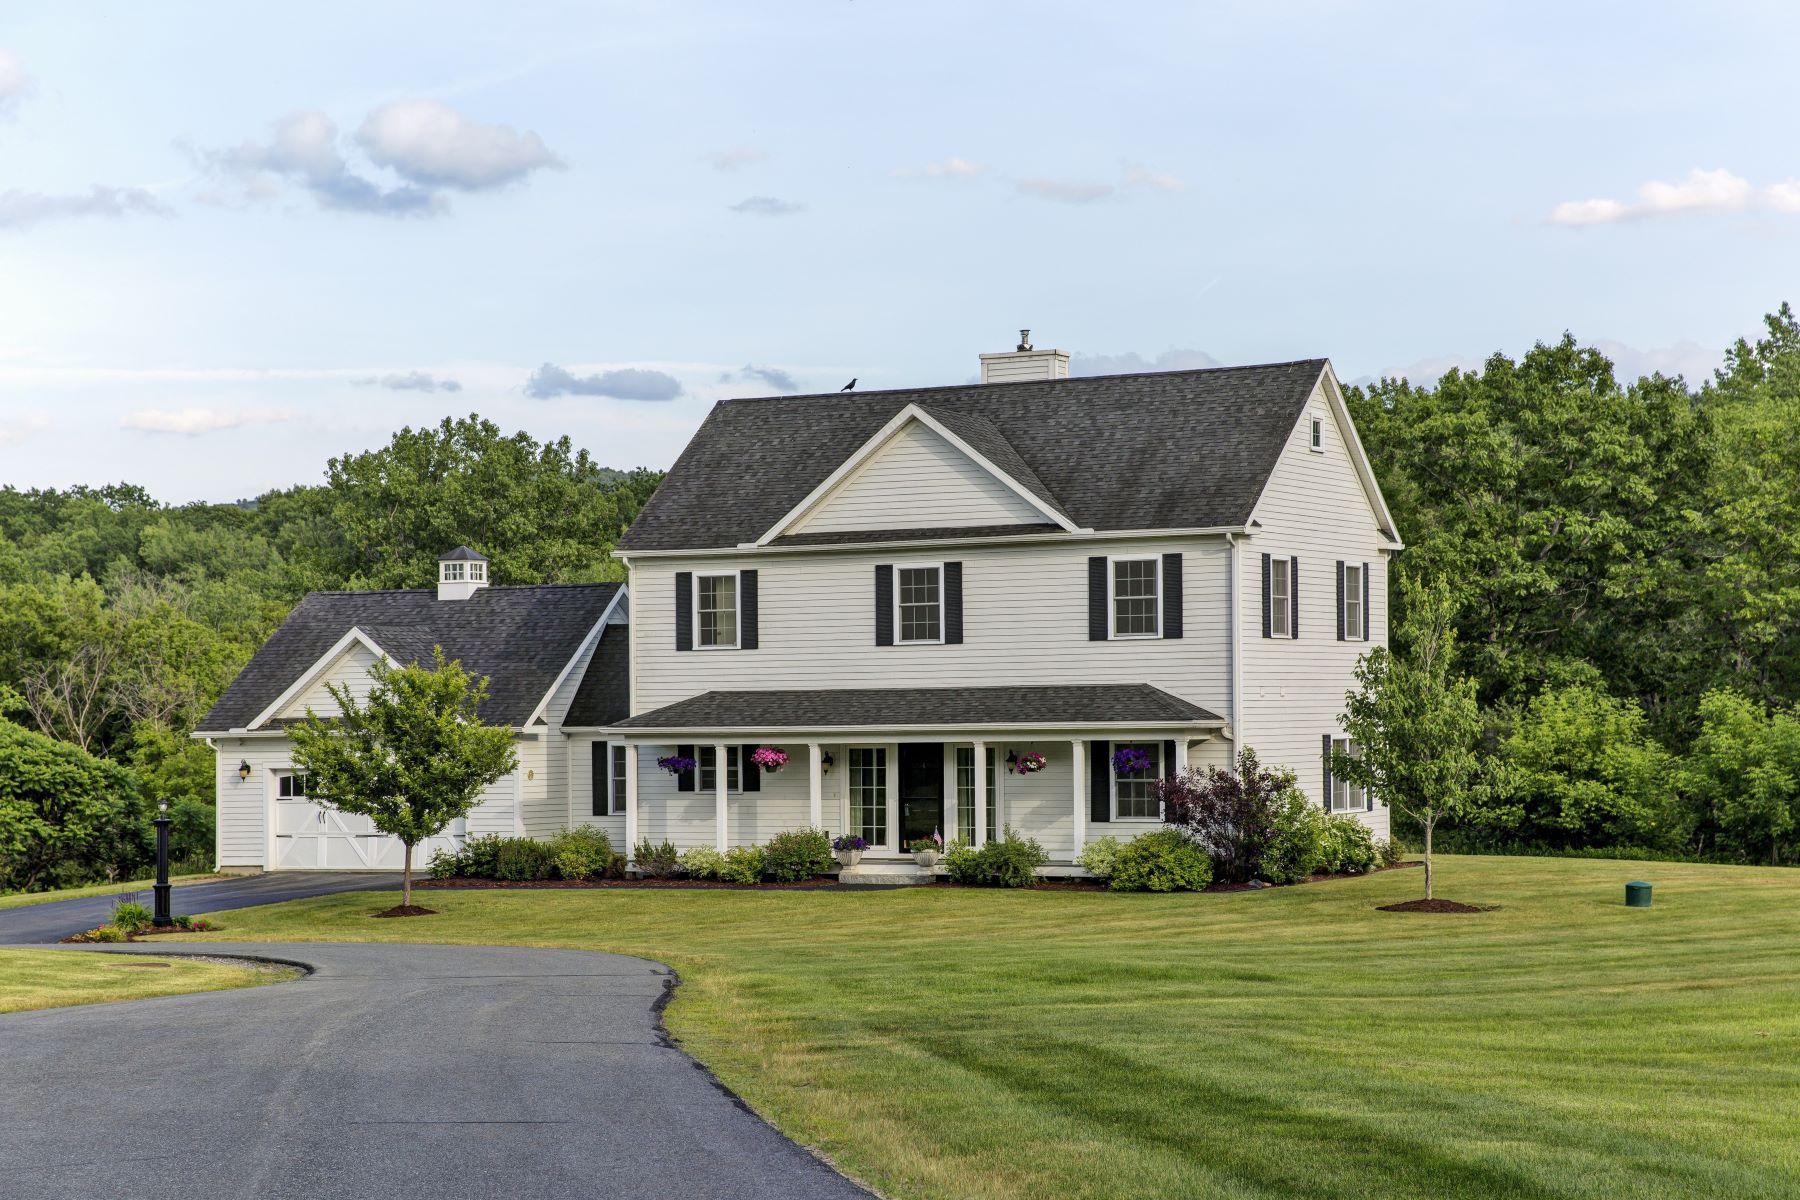 Частный односемейный дом для того Продажа на Four Bedroom Colonial in Lebanon 4 Black Bear, Lebanon, Нью-Гэмпшир, 03766 Соединенные Штаты